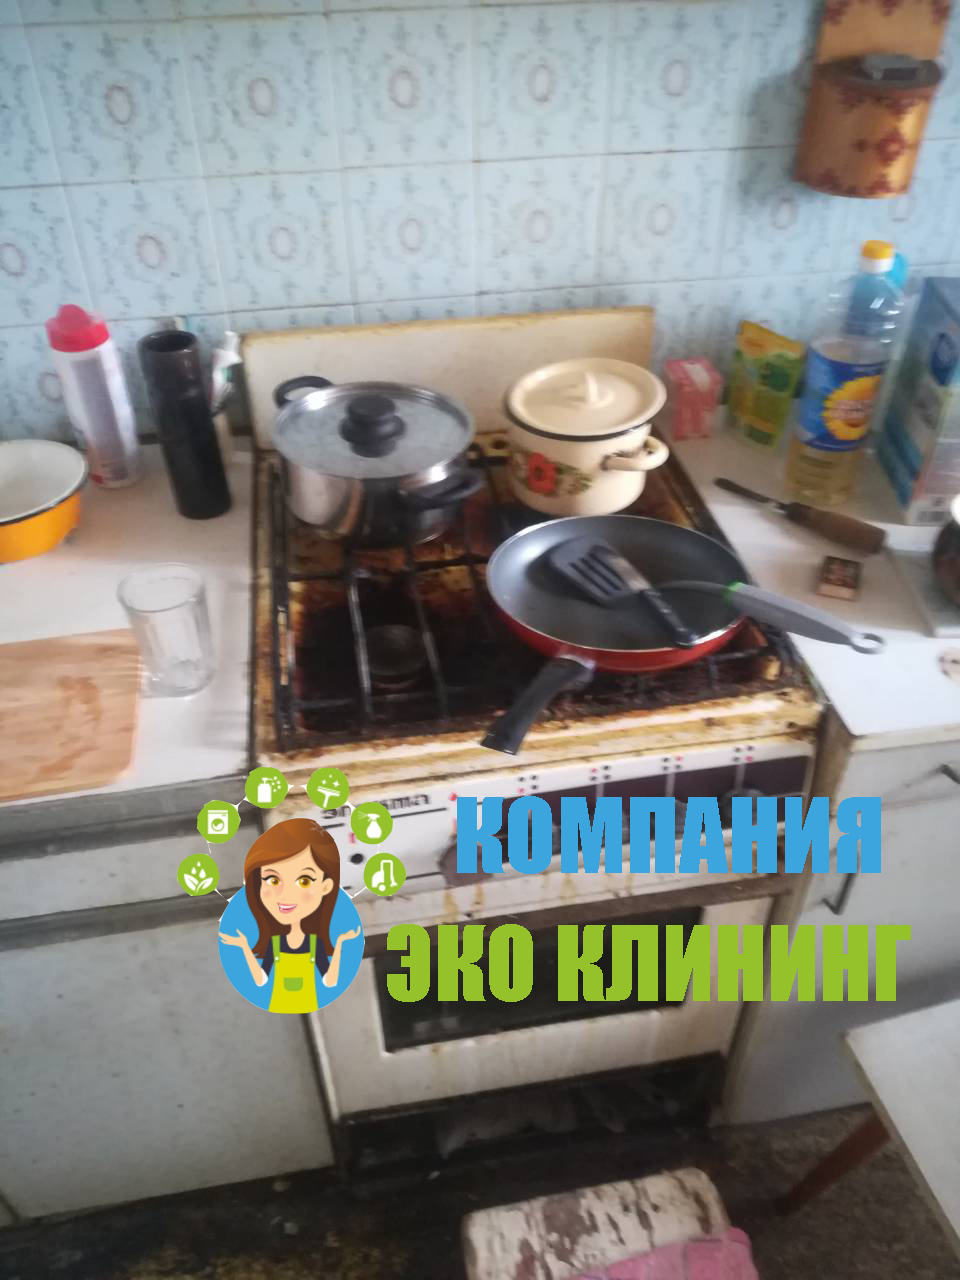 уборка кухни: как отмыть плиту от жира - до уборки